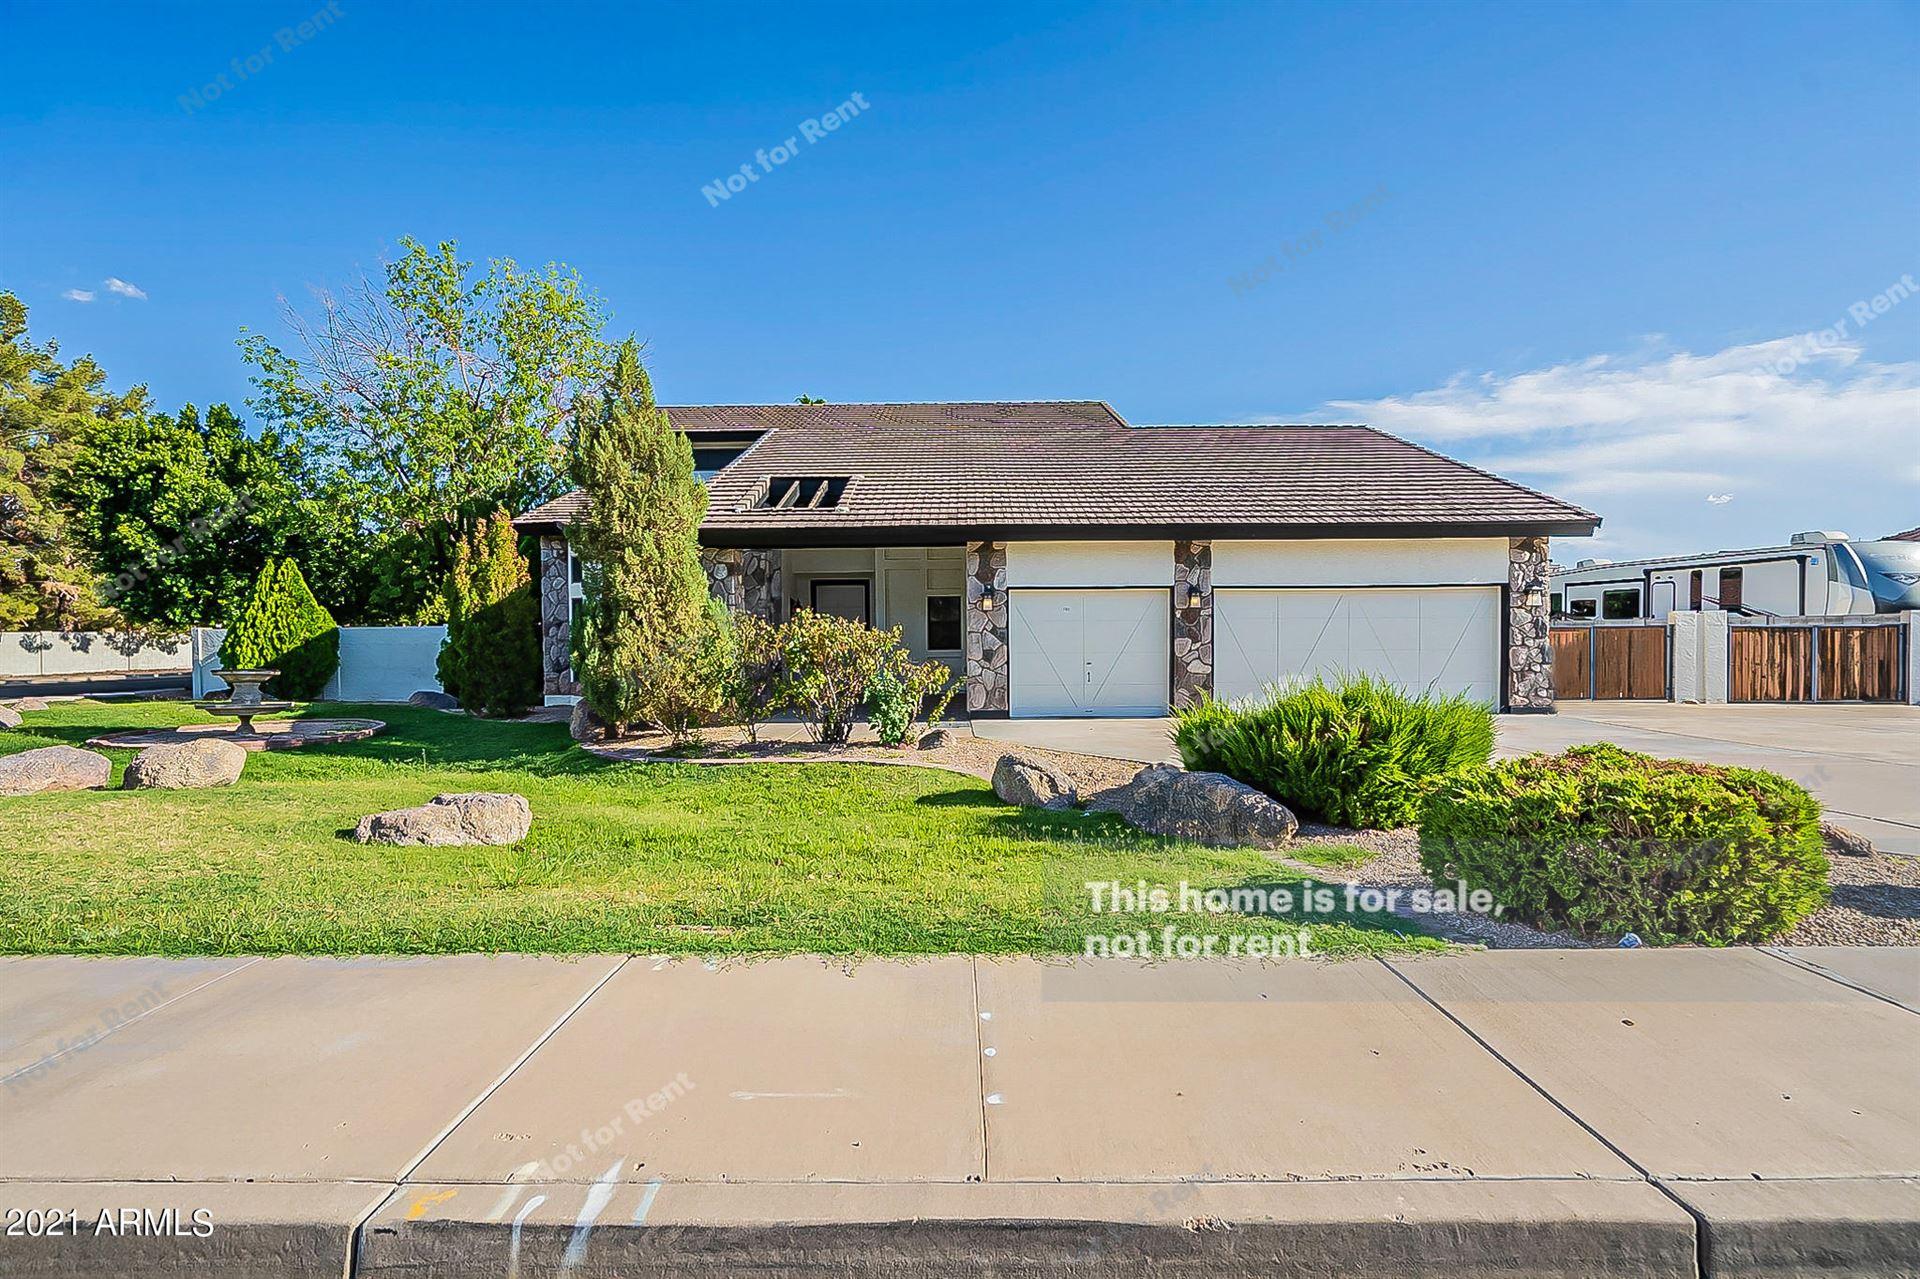 2149 E HERMOSA VISTA Drive, Mesa, AZ 85213 - MLS#: 6272859